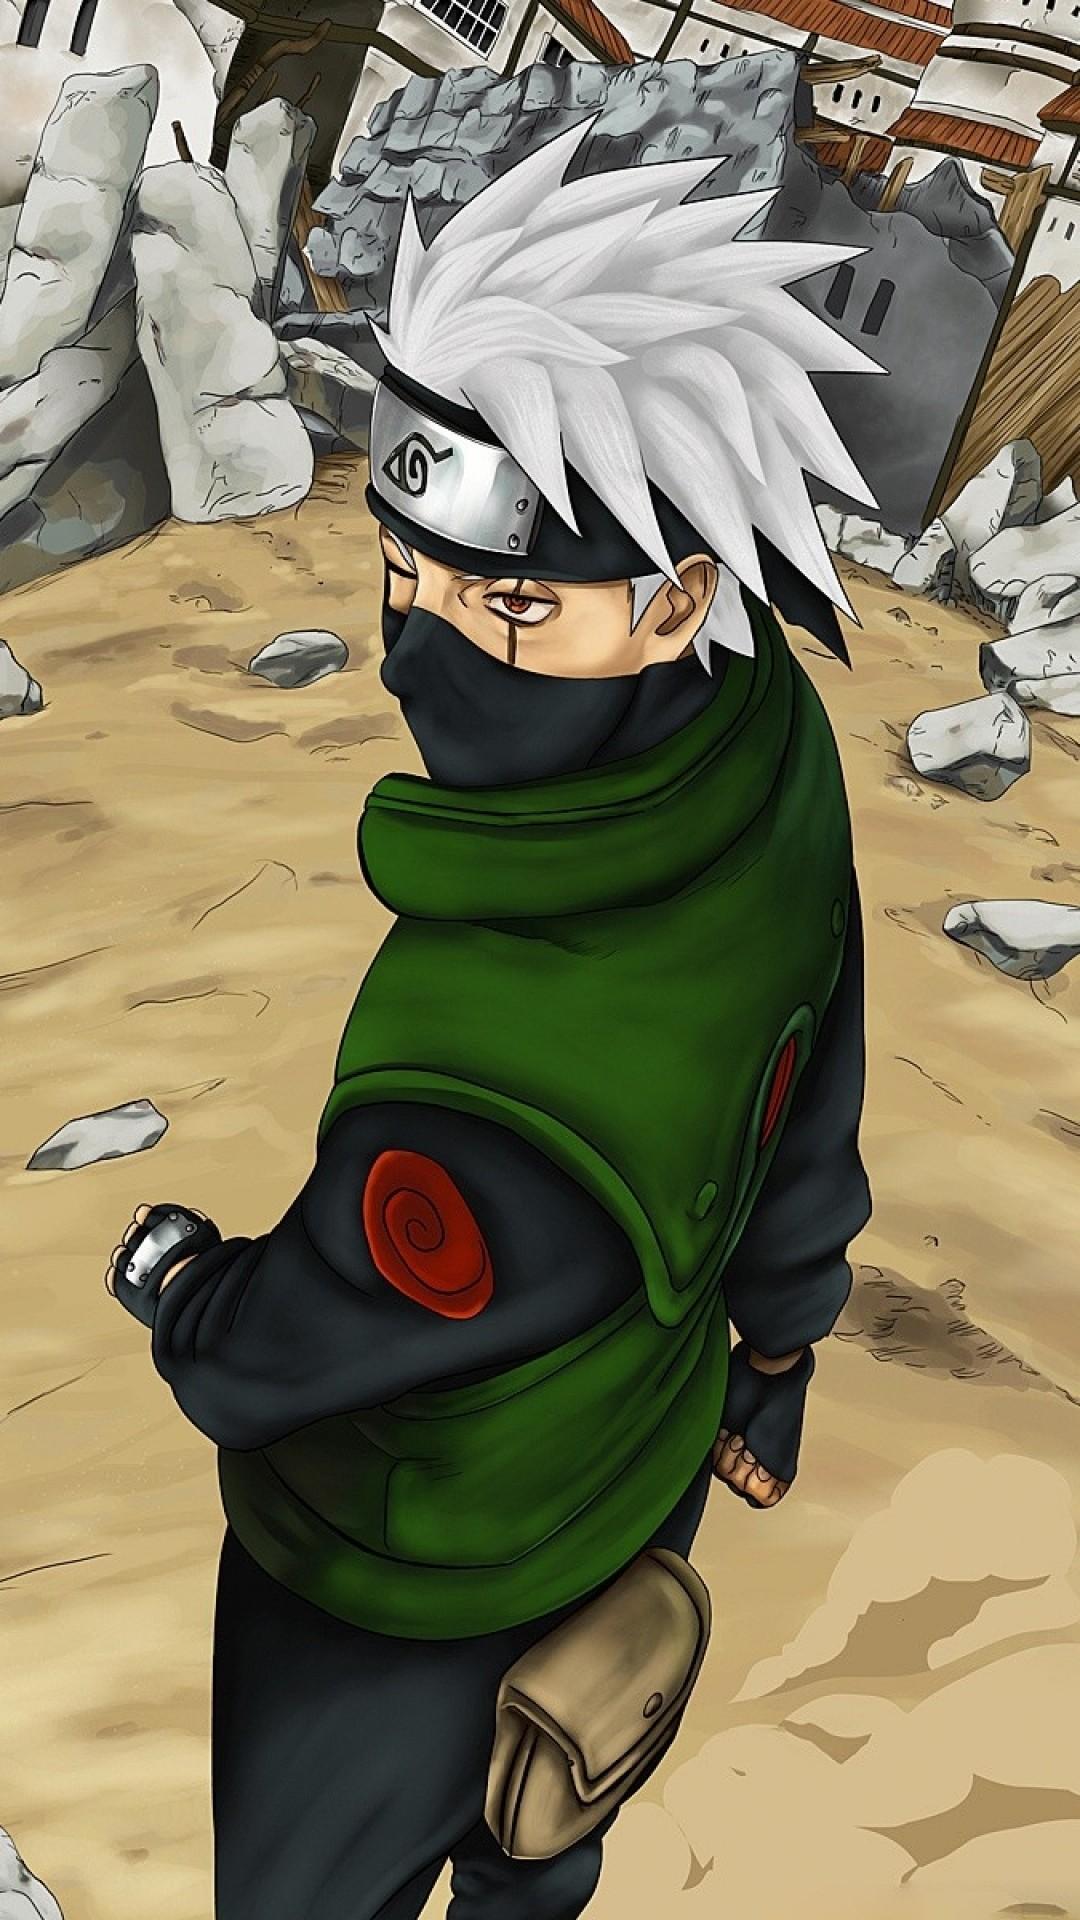 Naruto Shippuuden Naruto Man Mask Sand #iPhone #6 #wallpaper